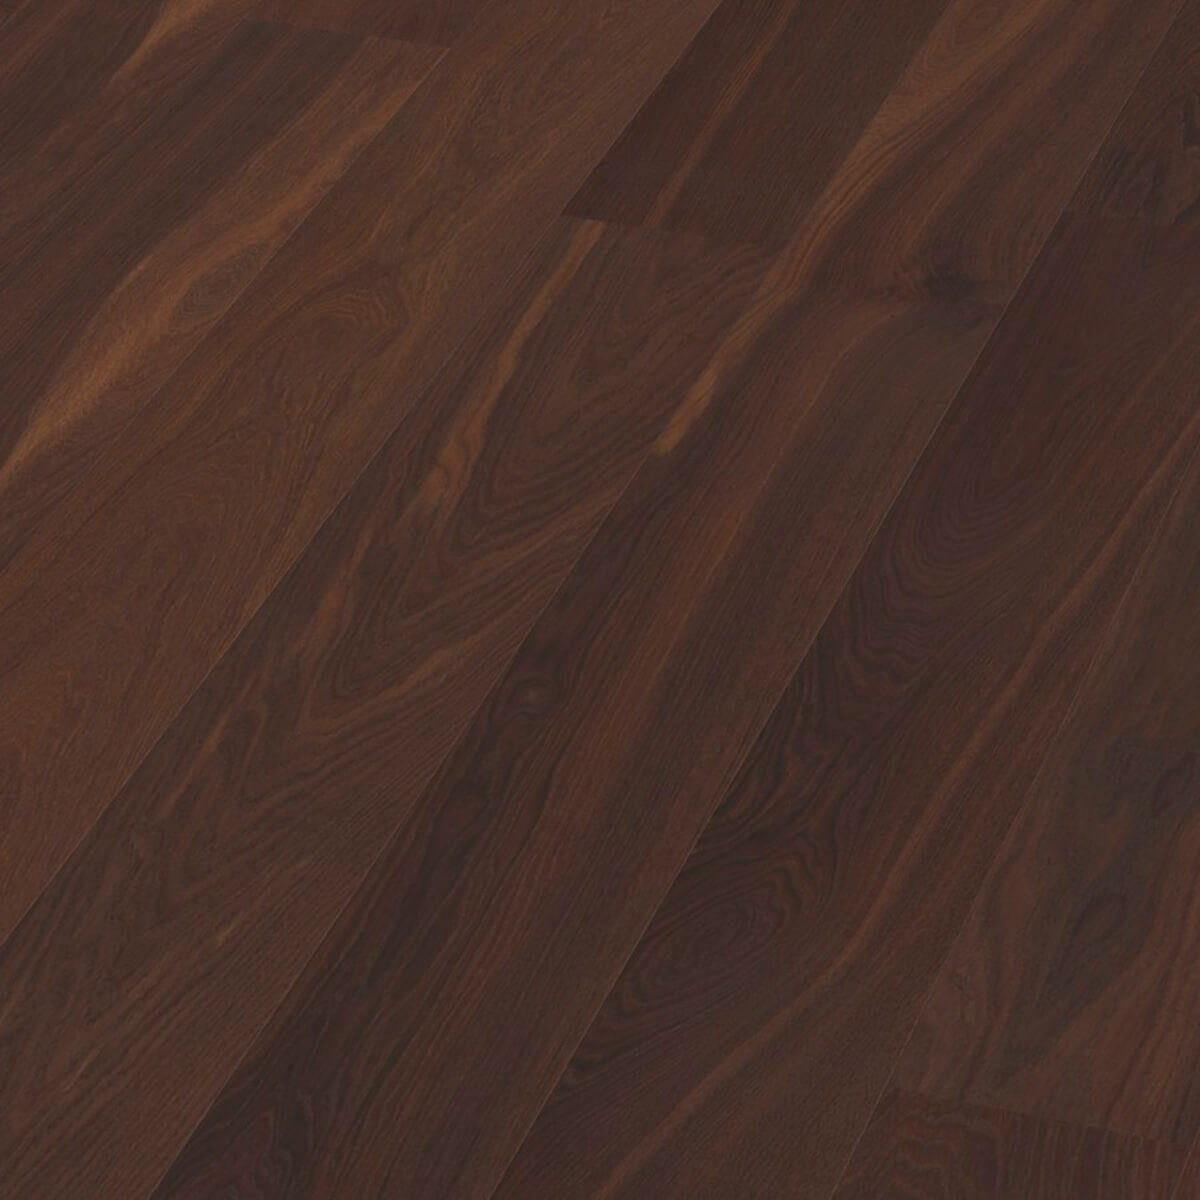 Parchet stratificat stejar smoked plank_1